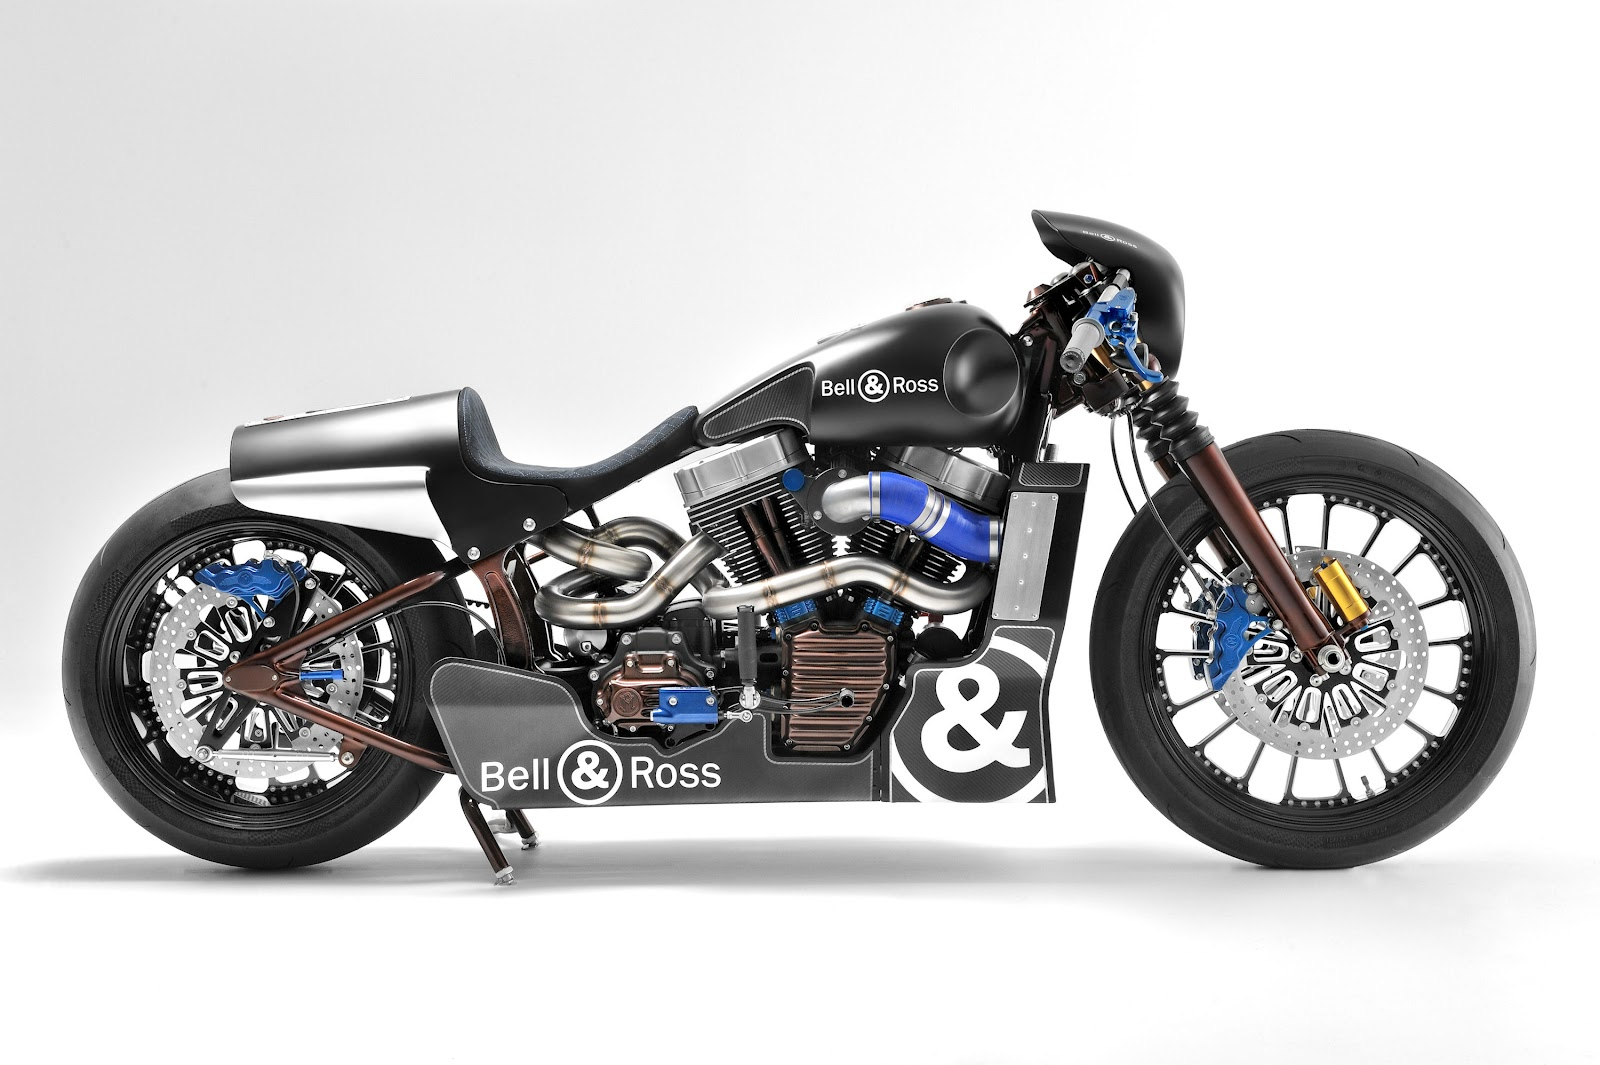 harley davidson custom motorcycles takeyoshi images. Black Bedroom Furniture Sets. Home Design Ideas